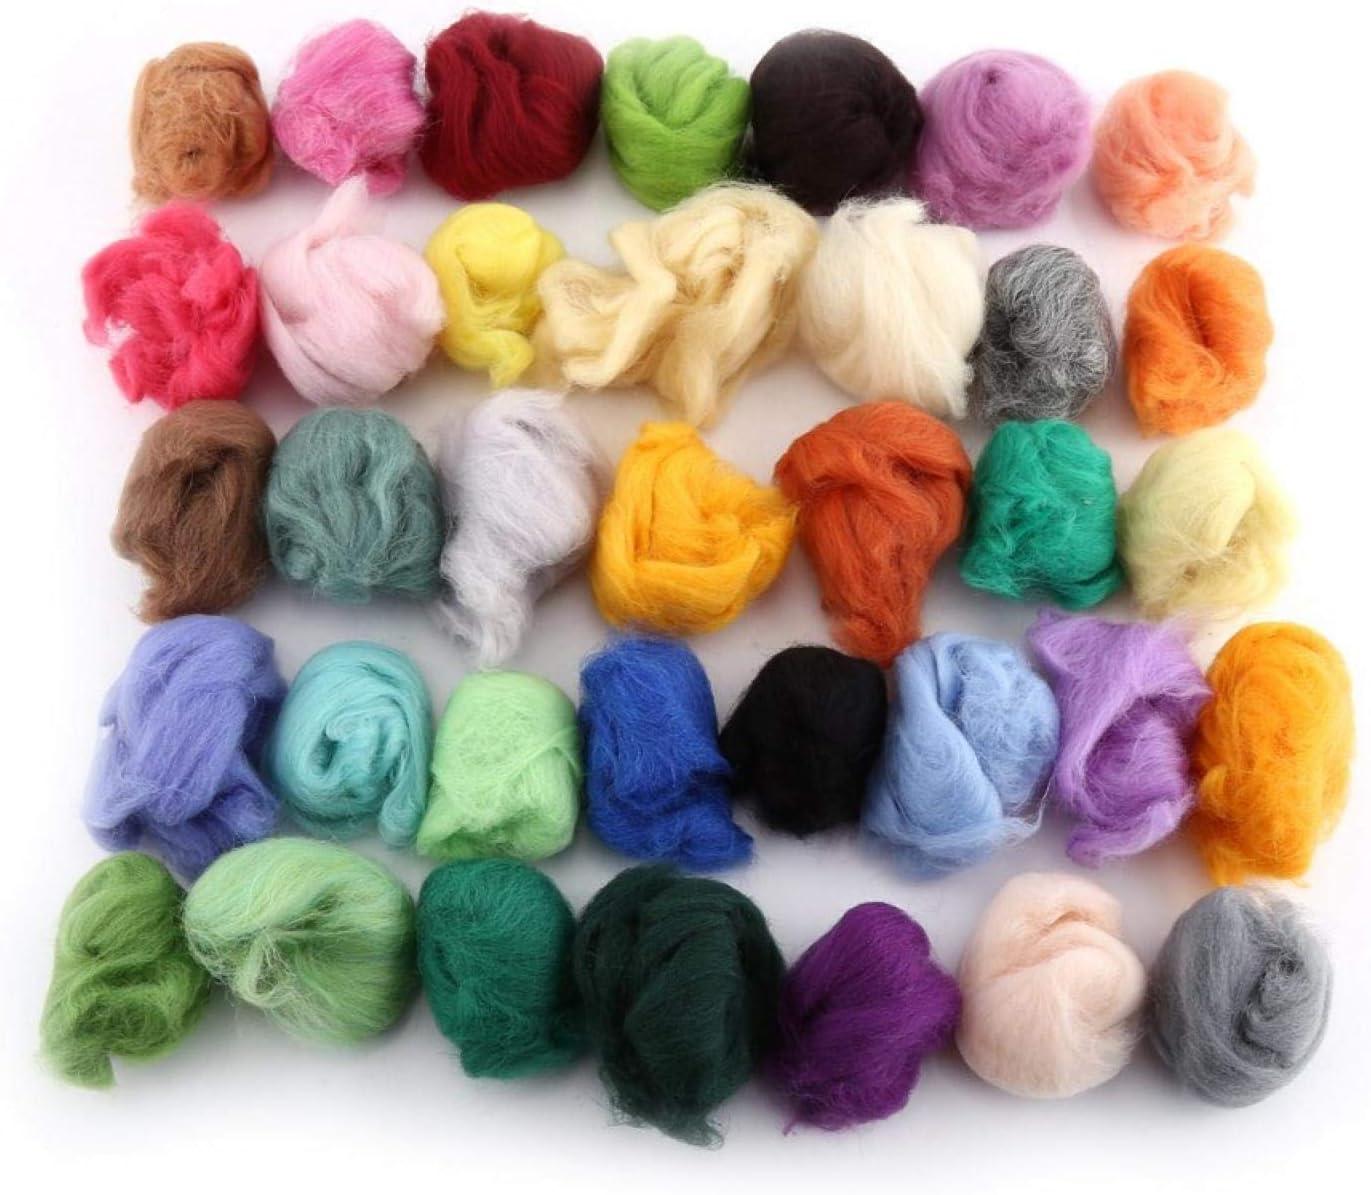 Wool Fiber Spinning Needle Mesa Mall Felting Soft Kit Texture Award Starter Set